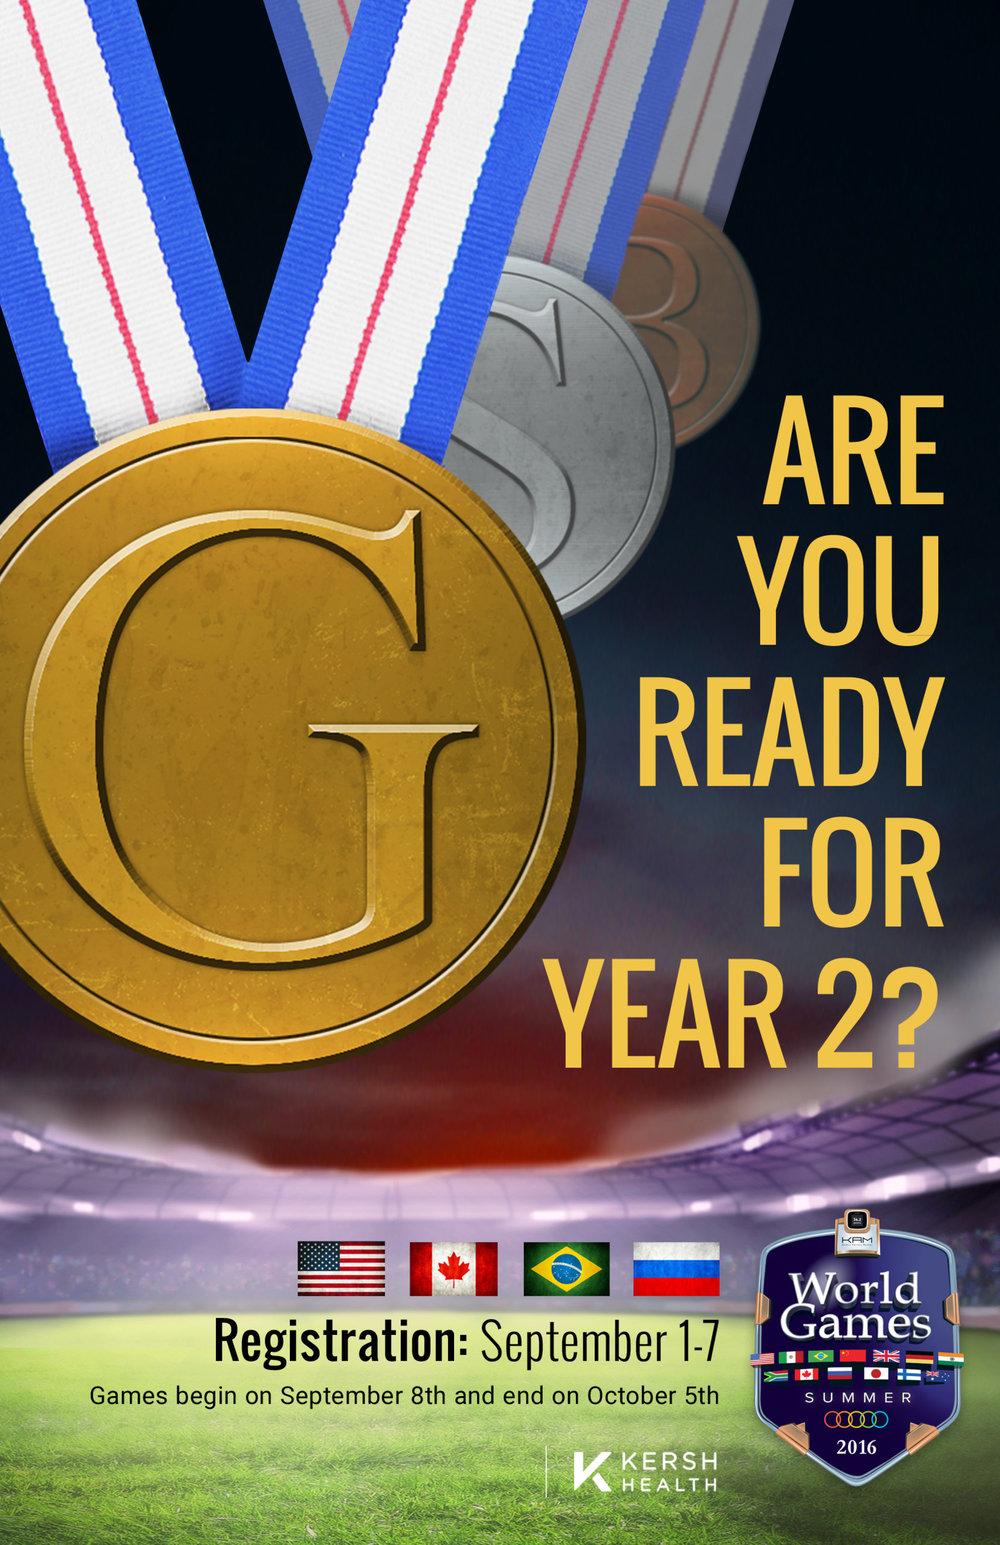 Summer Games - Year 2 Poster.jpg